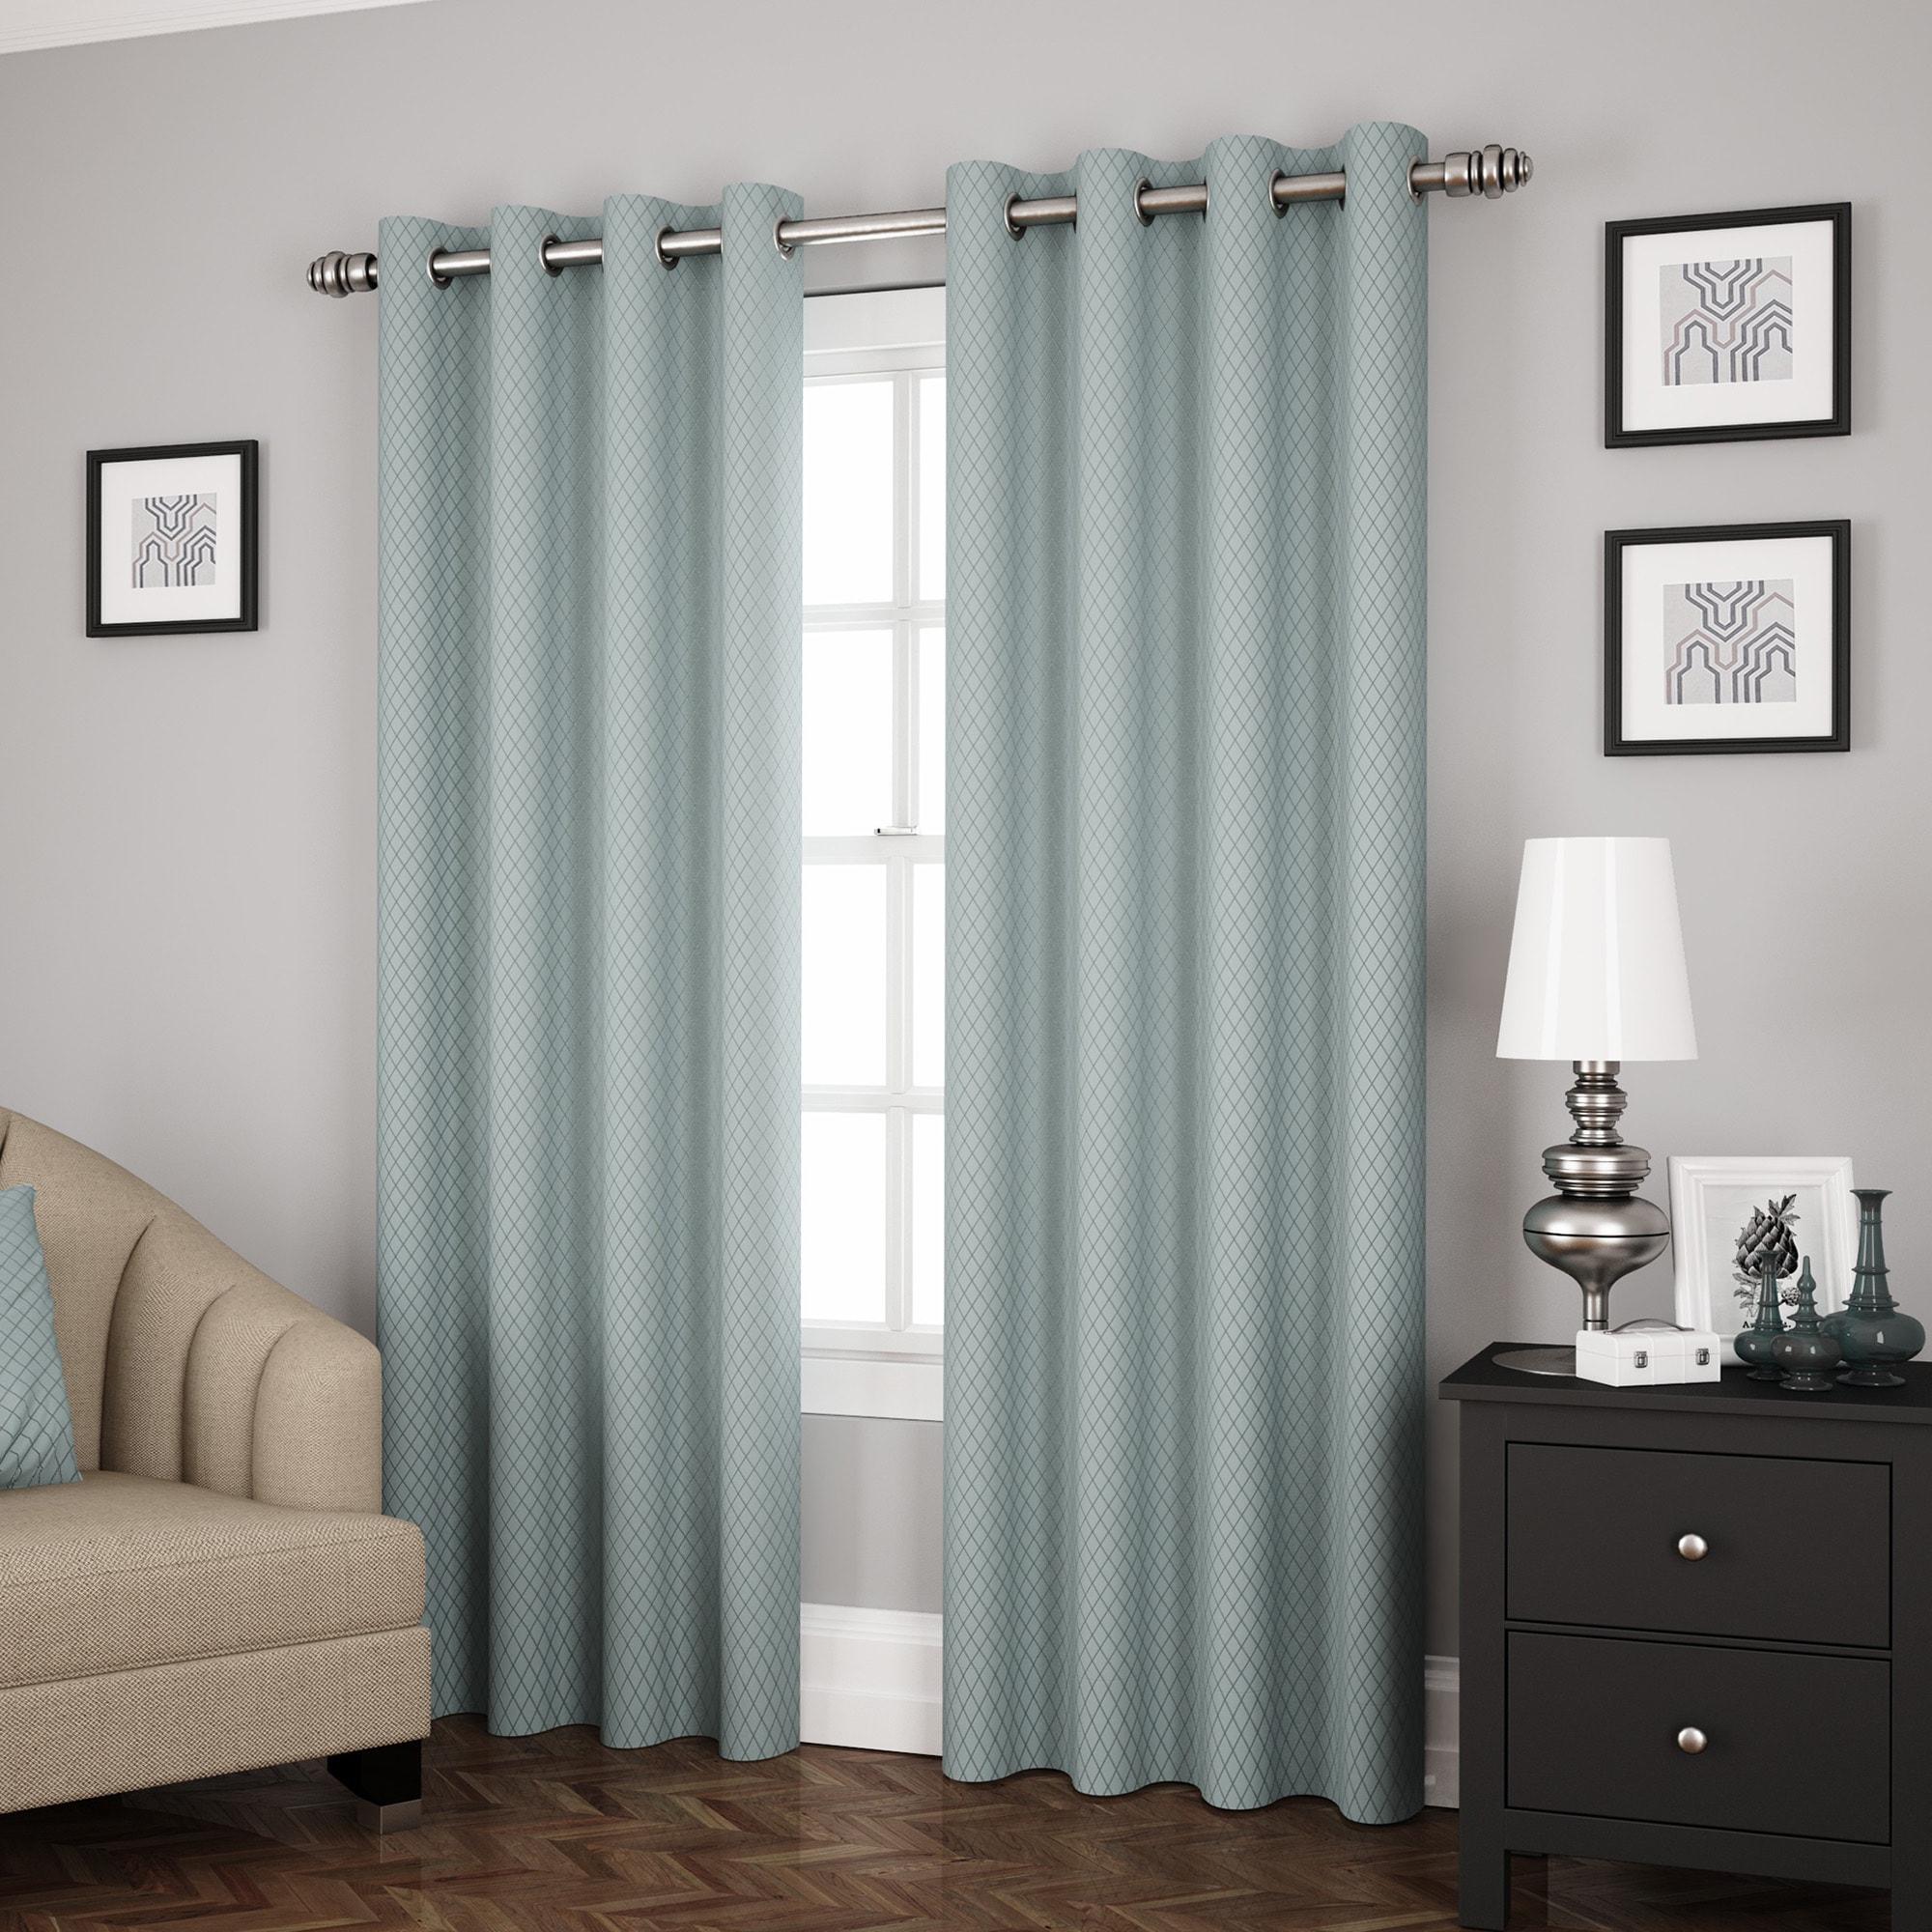 Eclipse Ridley Room Darkening Window Curtain Panel (As Is...